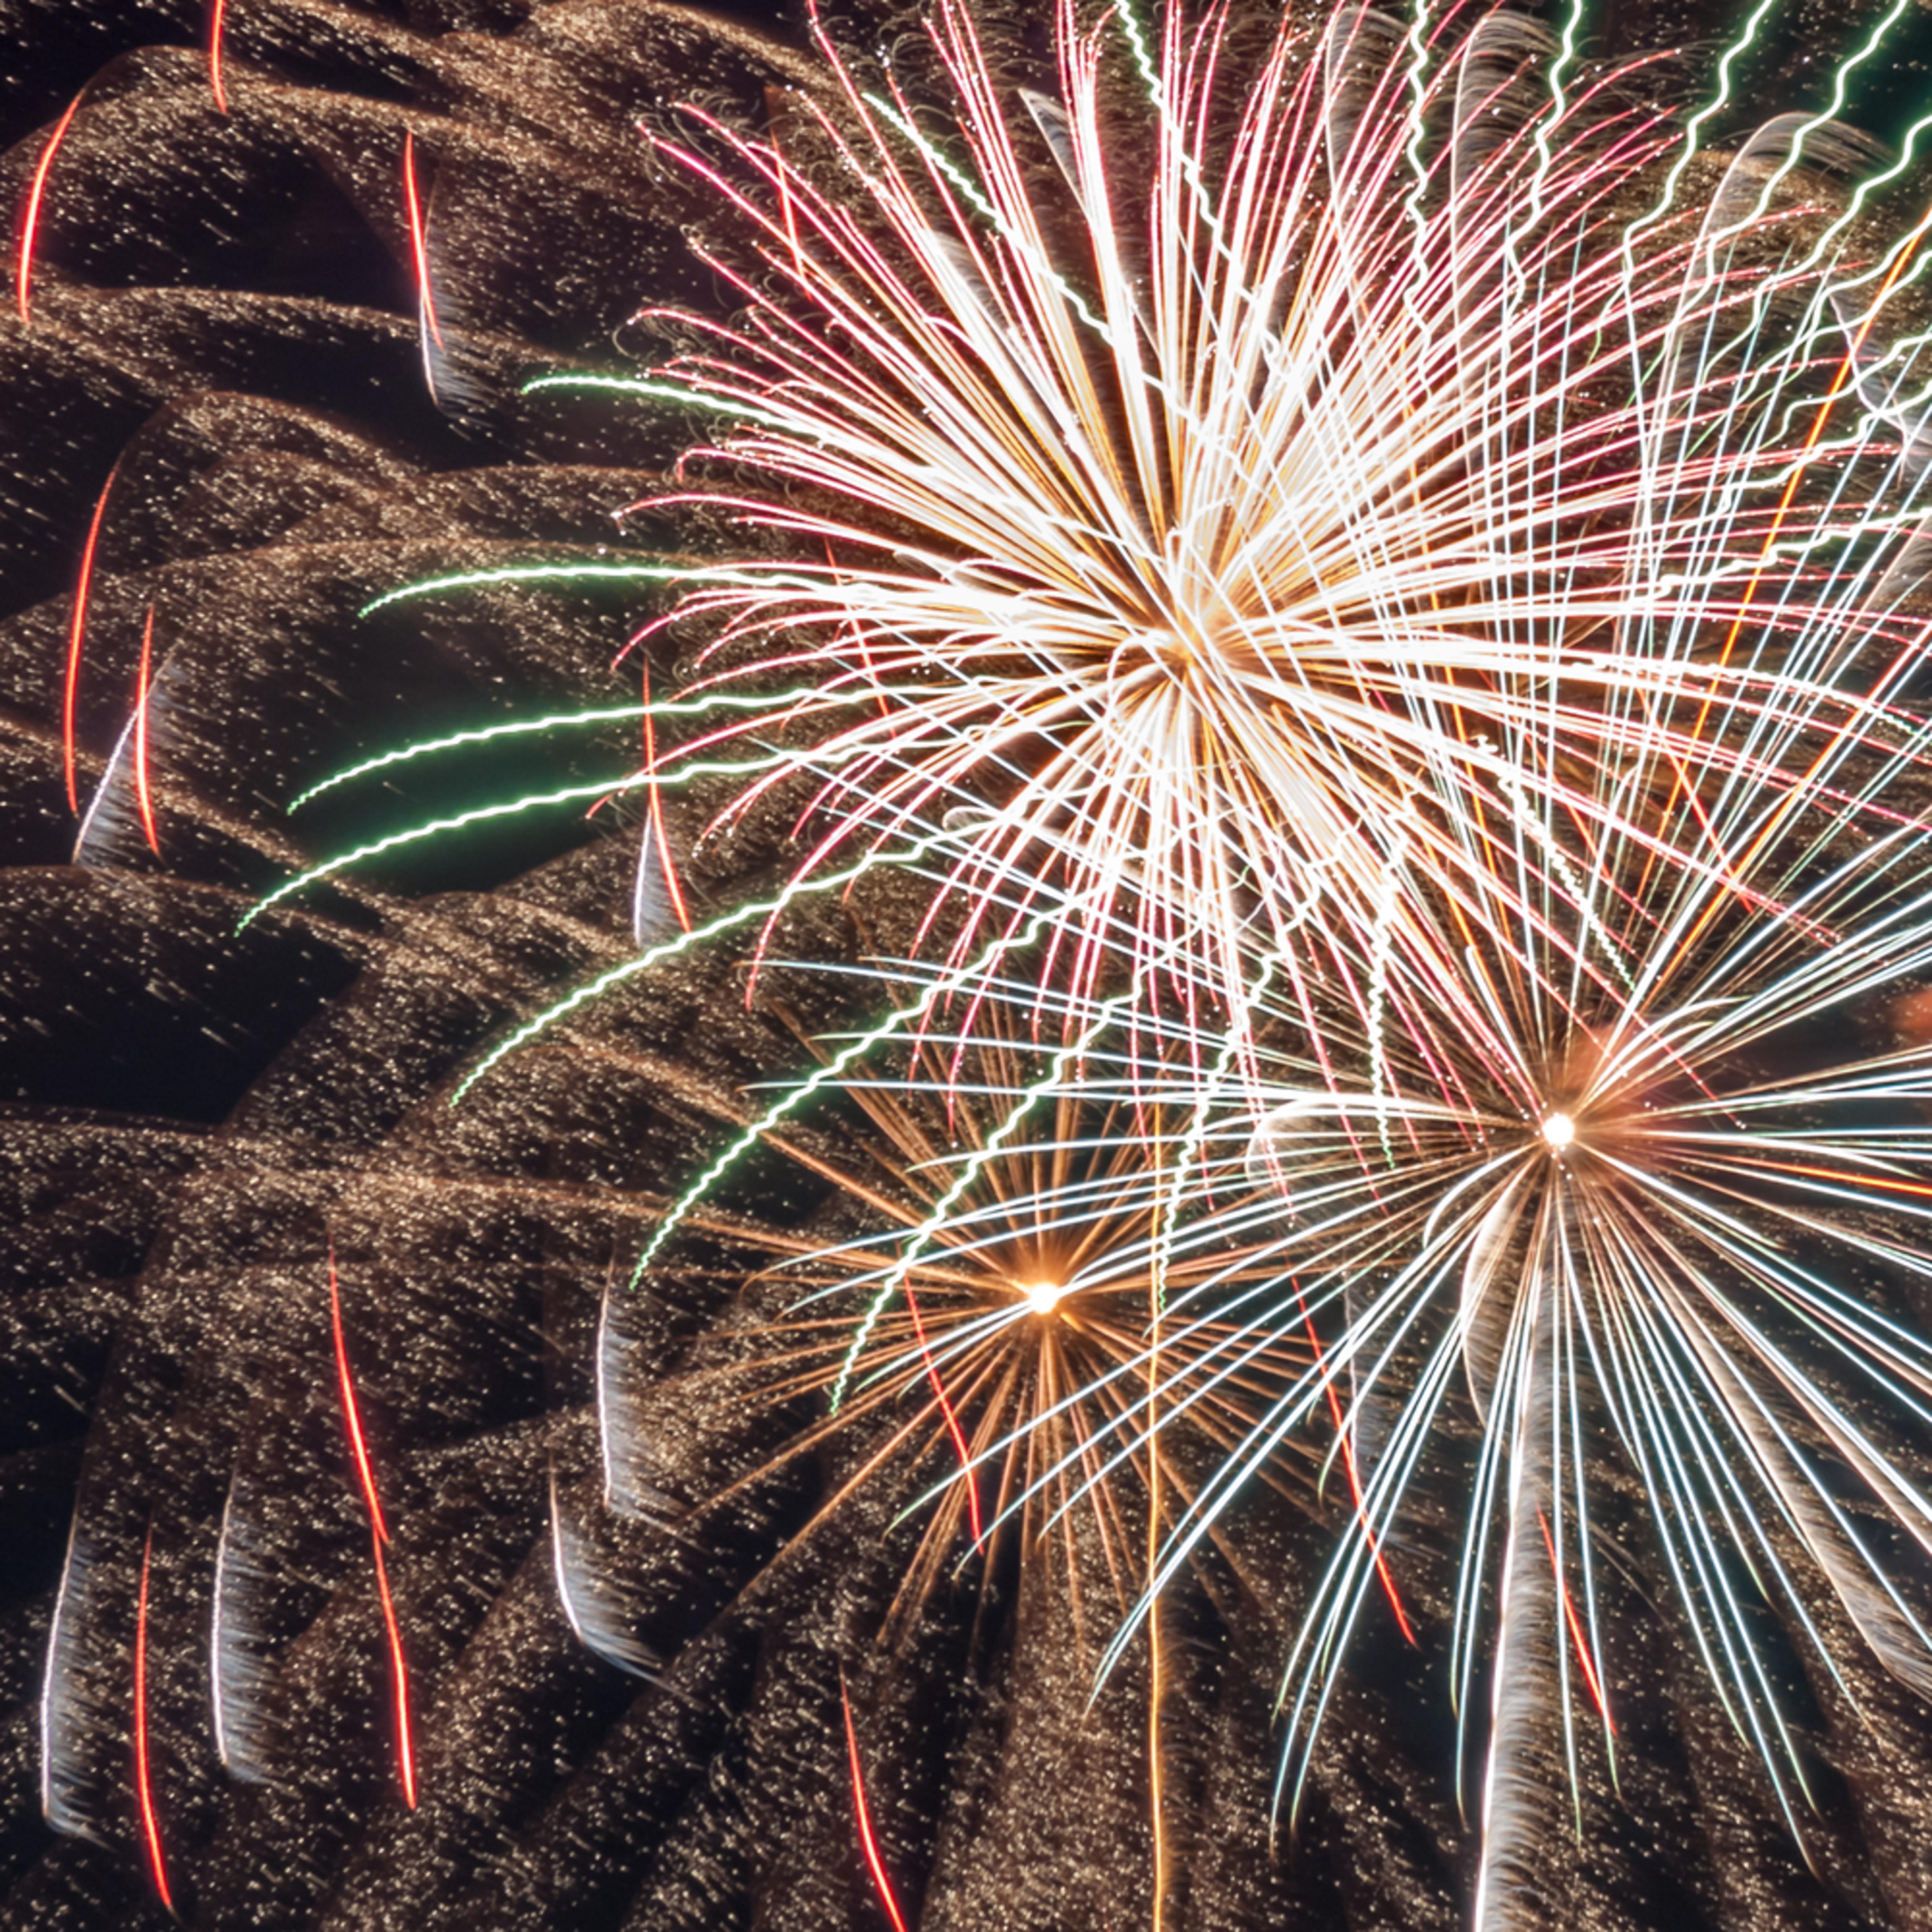 Fireworks 0714 5 lximyo